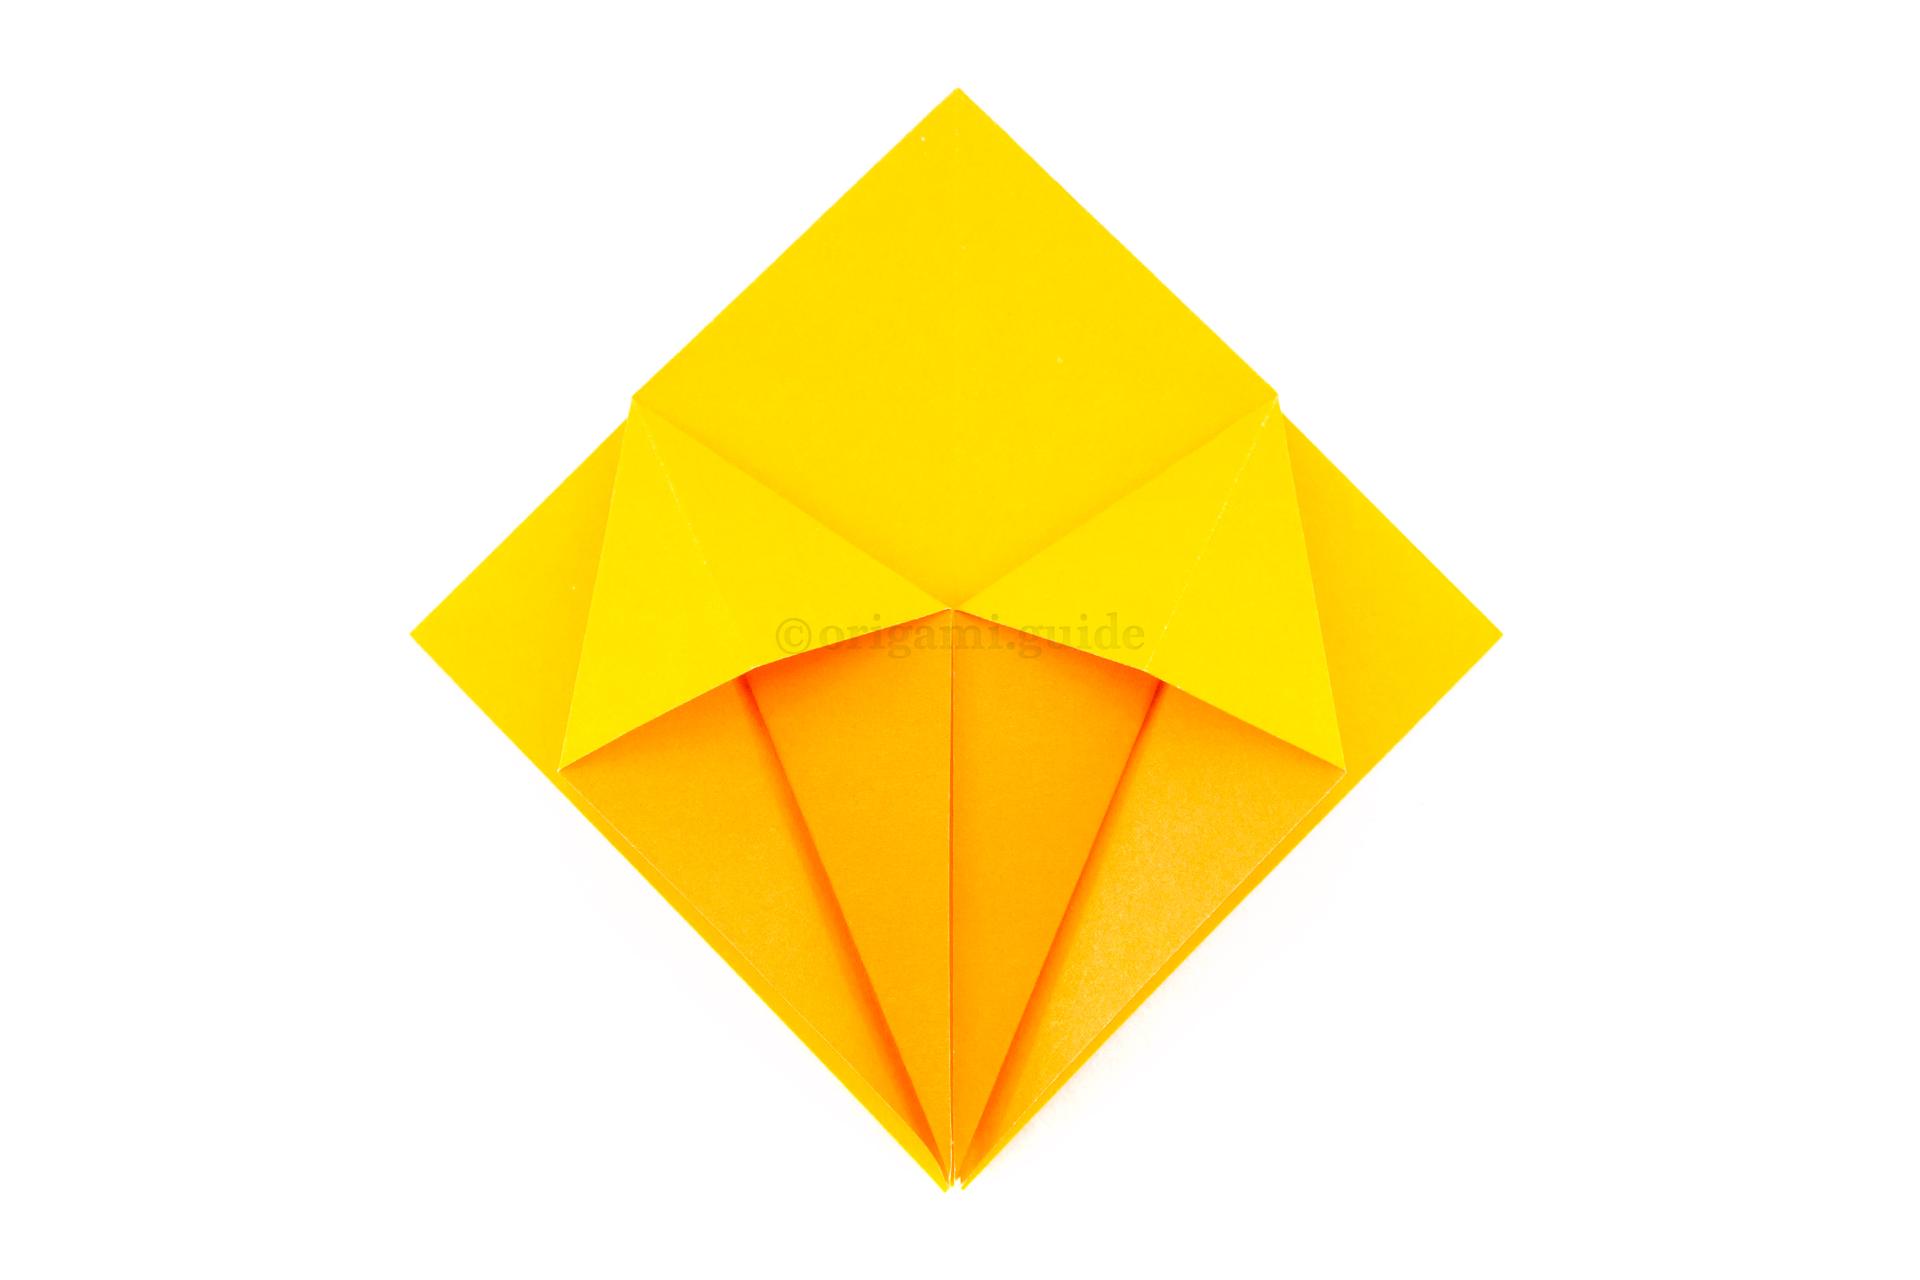 Origami Favor Sunburst Box! #origamihearts | Origami star box, Origami box  easy, Origami stars | 1280x1920